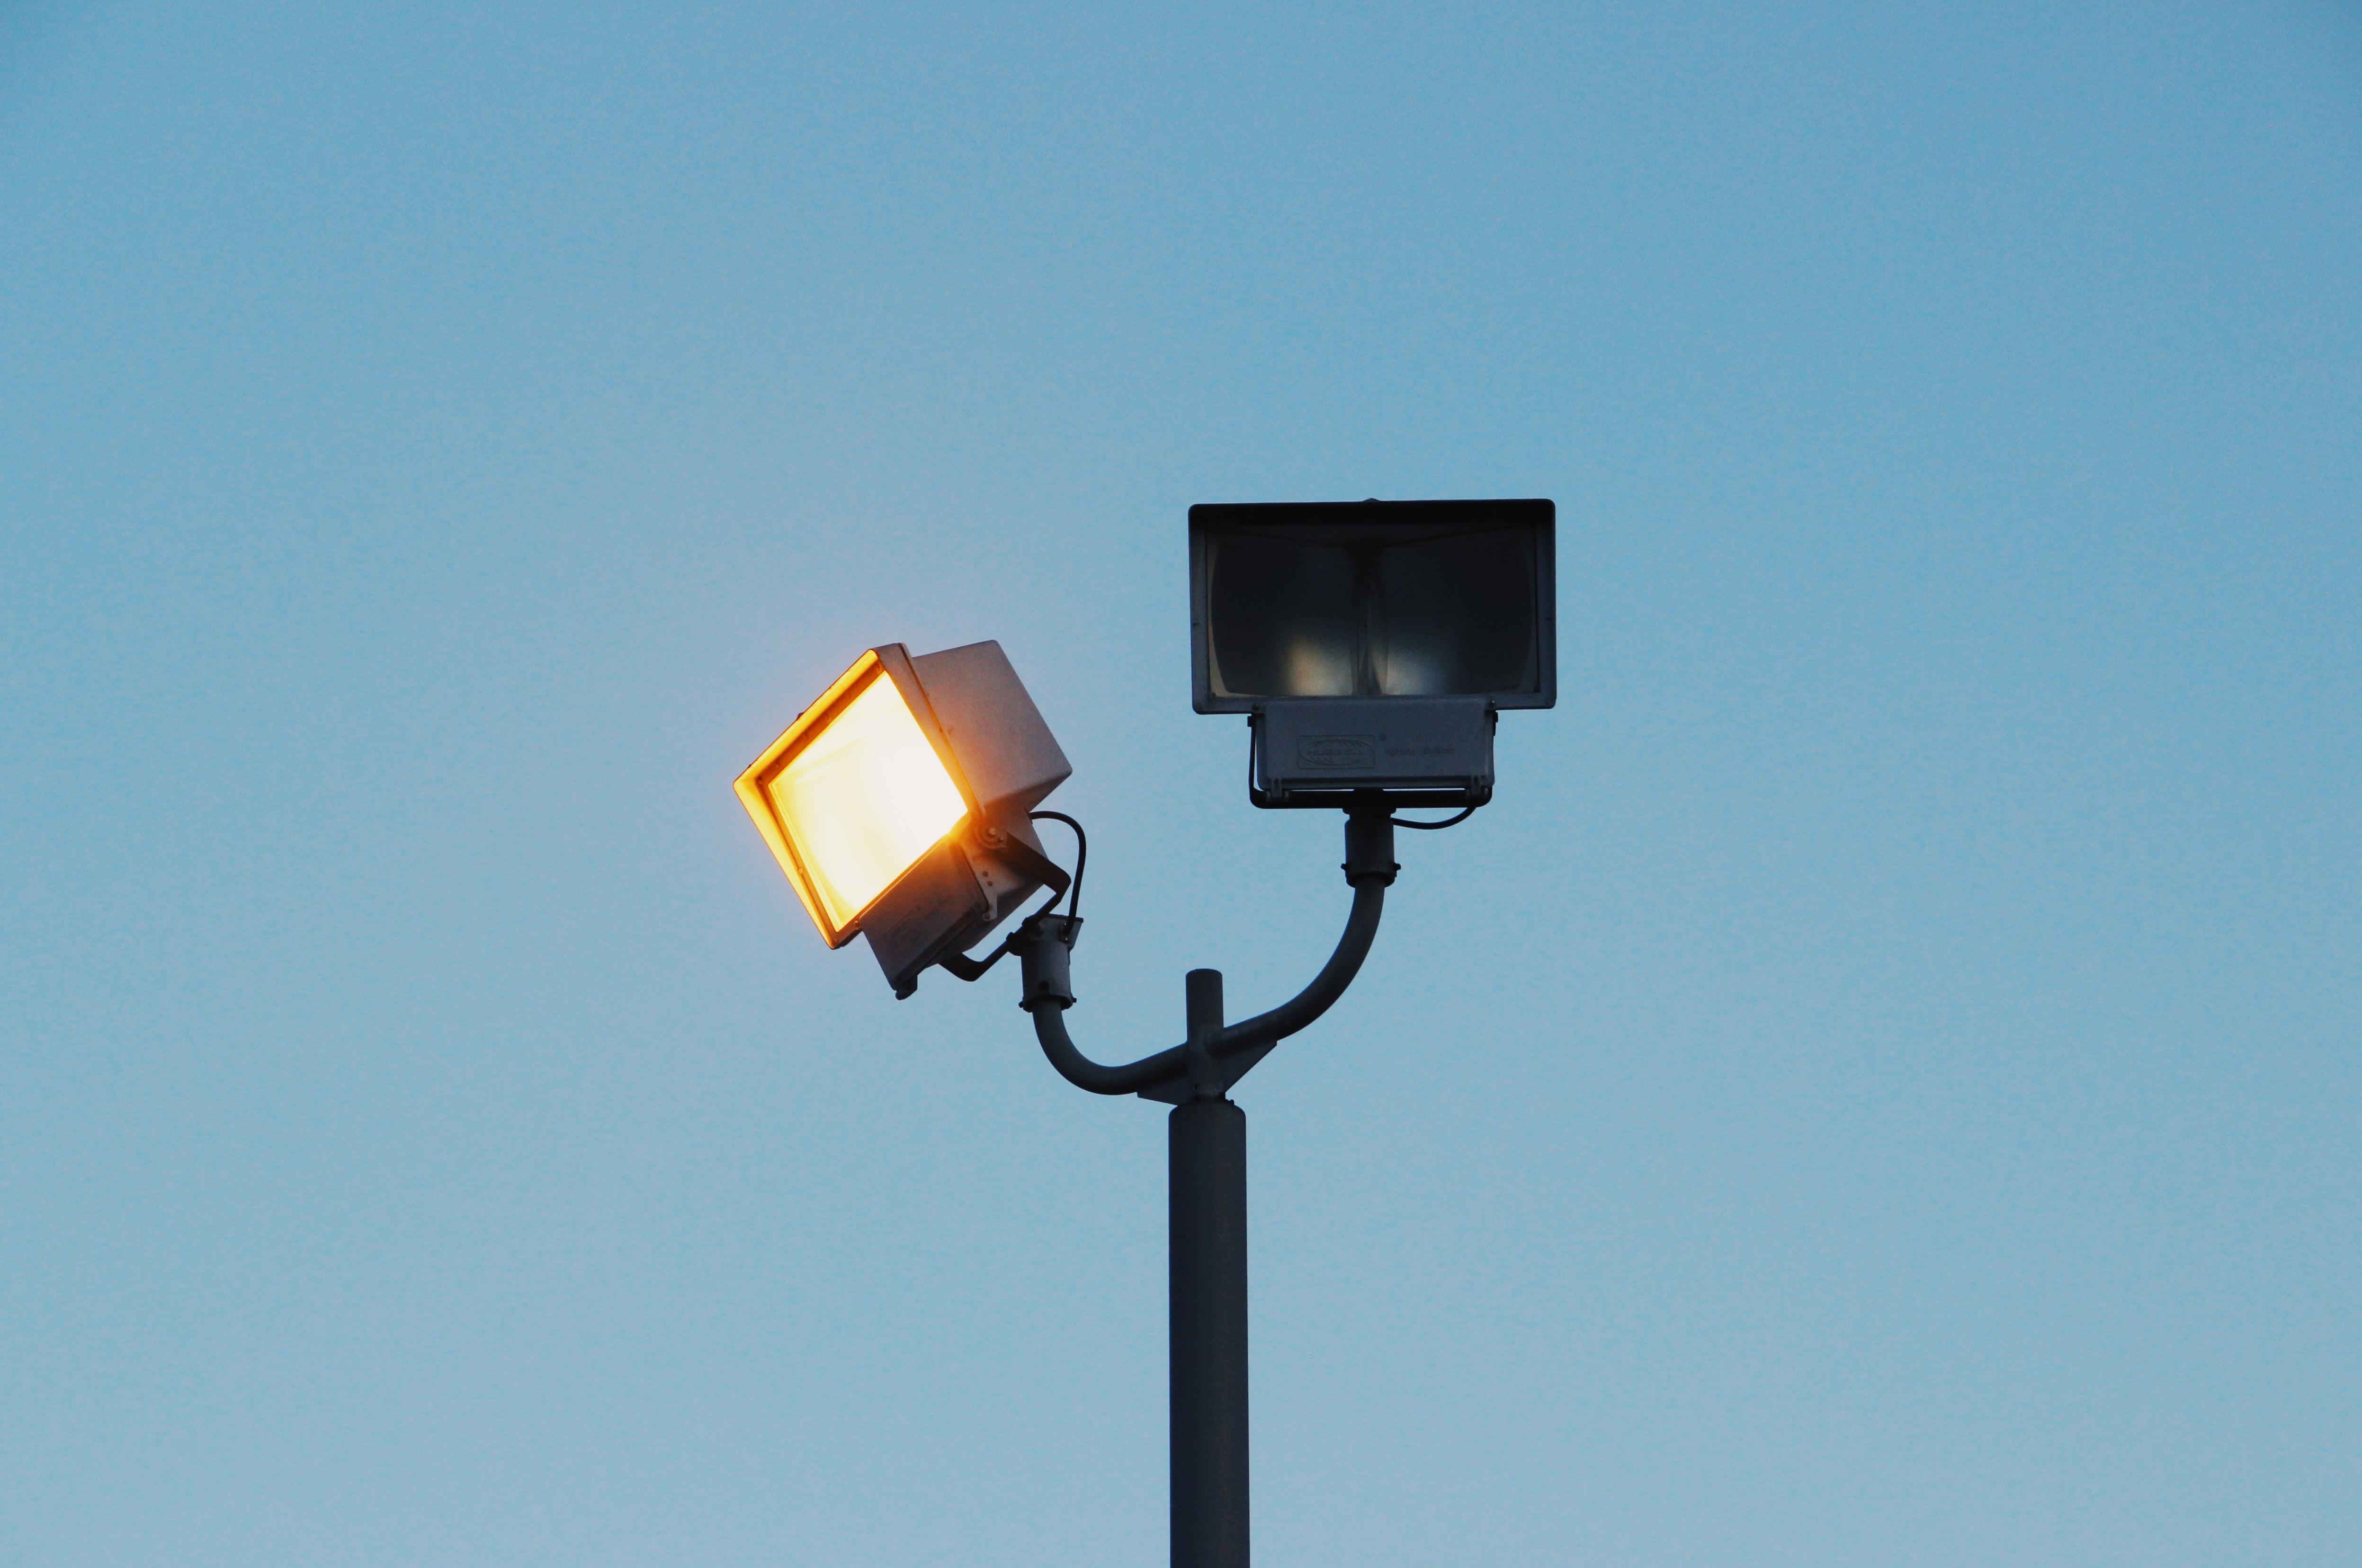 black spot light